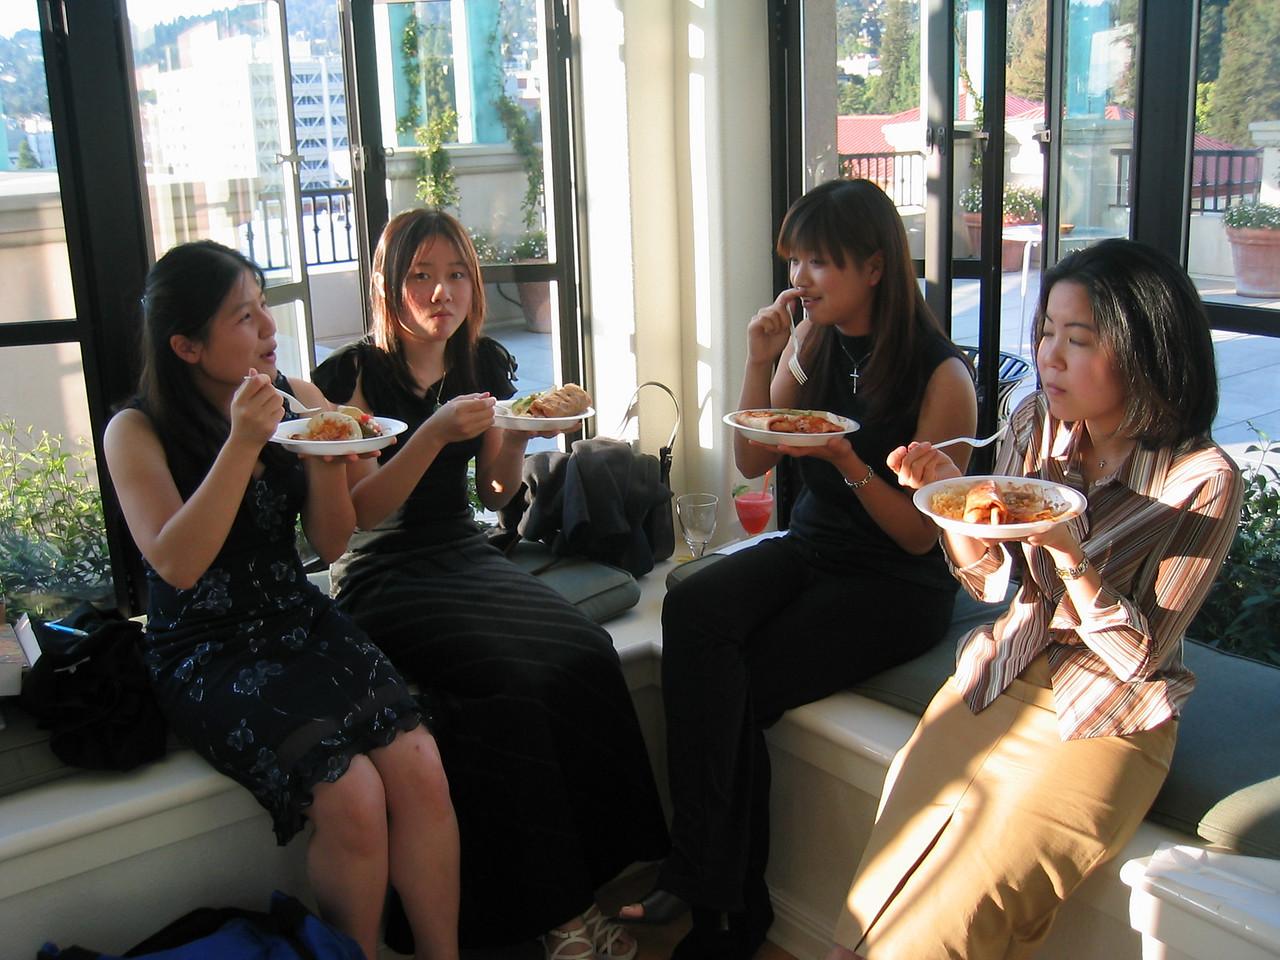 Da' ladies corner - May, Stephanie, Rita, & Lydia